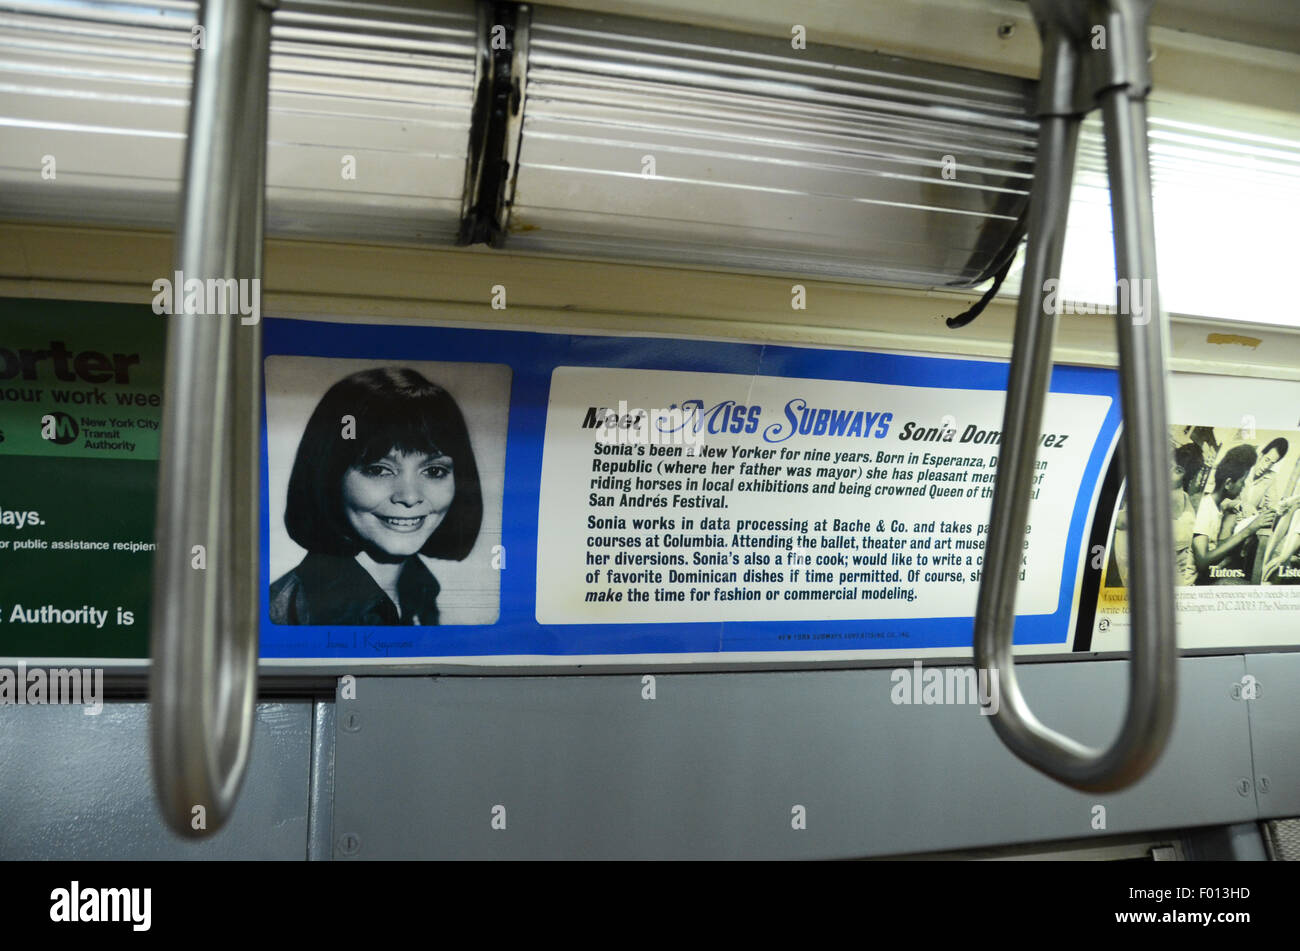 Vintage Adverts Stock Photos Images Alamy Hand Grip Kansa Busa New York Transit Museum Carriage Subway 1961 Grey Gray Livery